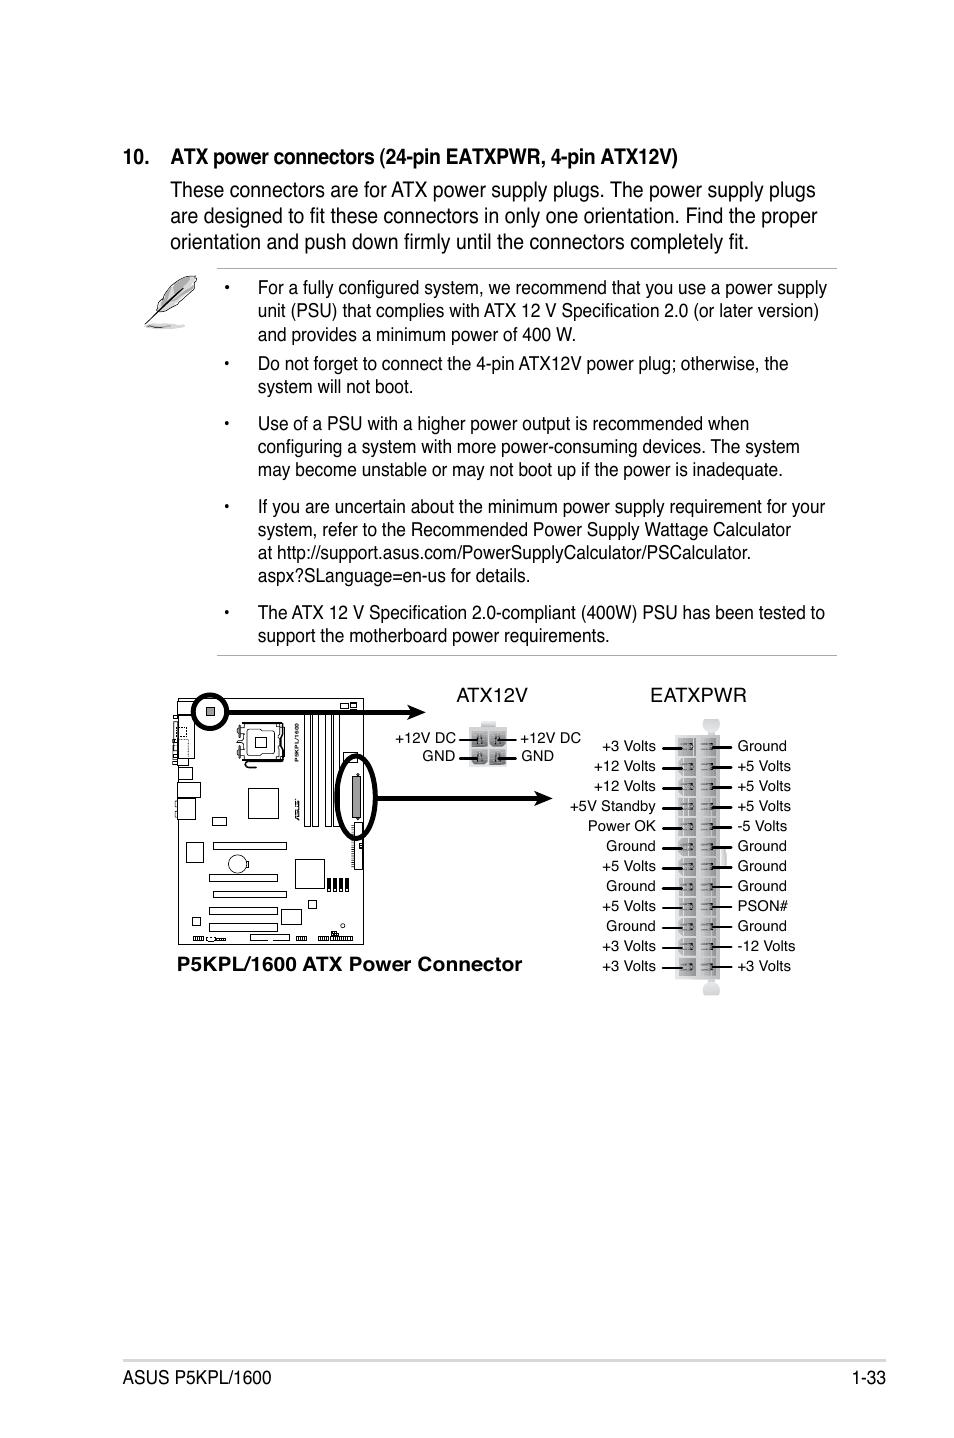 Asus p5kpl-c 1600 manuals.